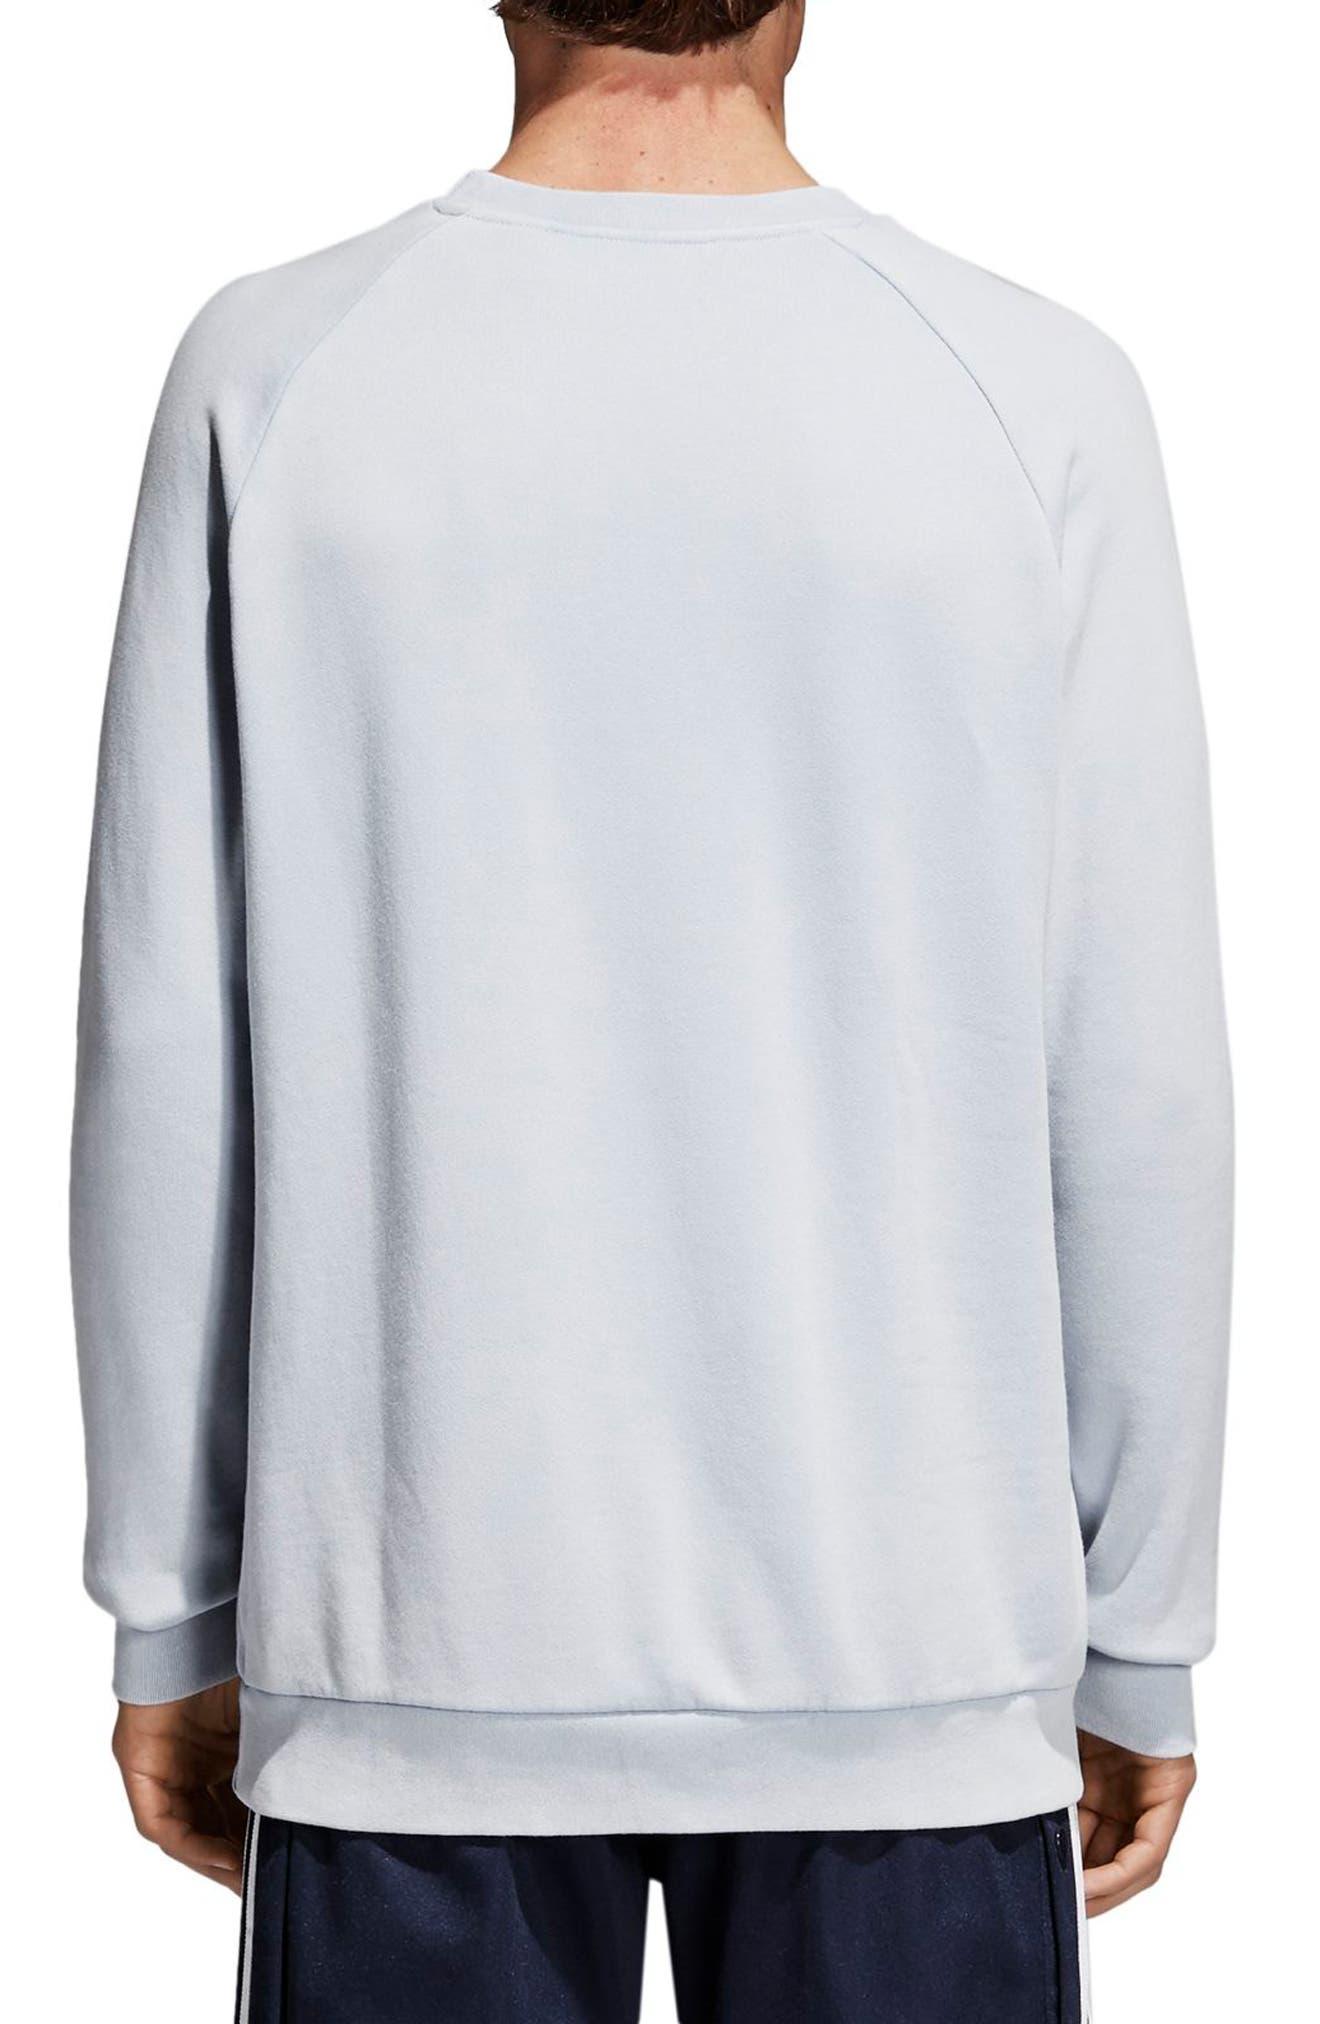 Trefoil Sweatshirt,                             Alternate thumbnail 2, color,                             459